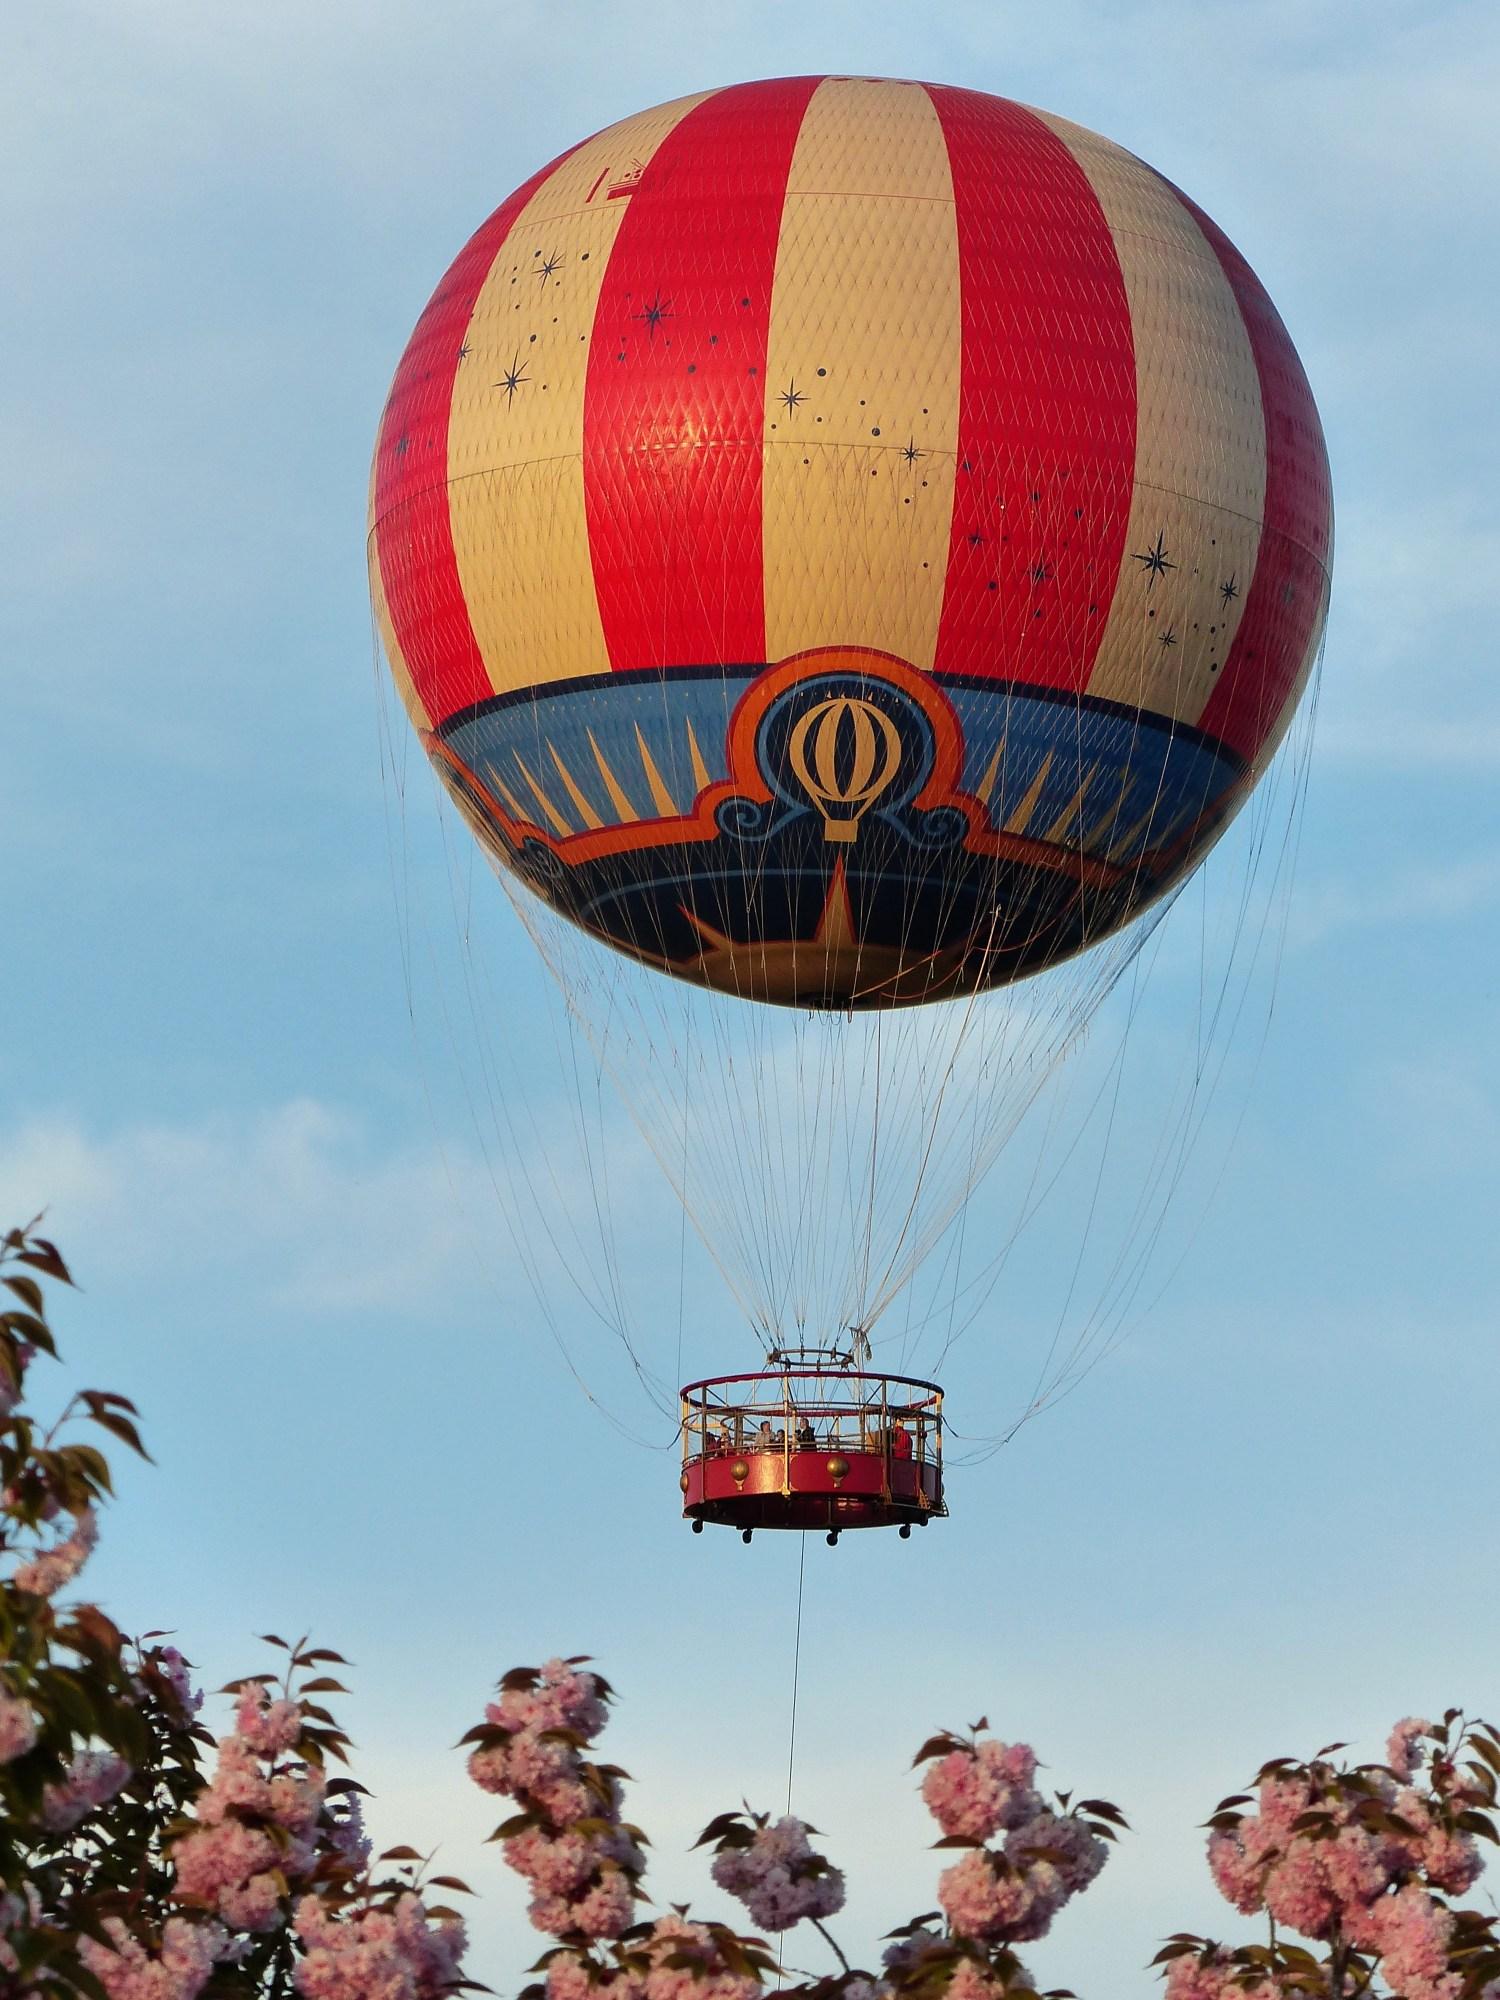 Promenade en ballon à Disneyland Paris.